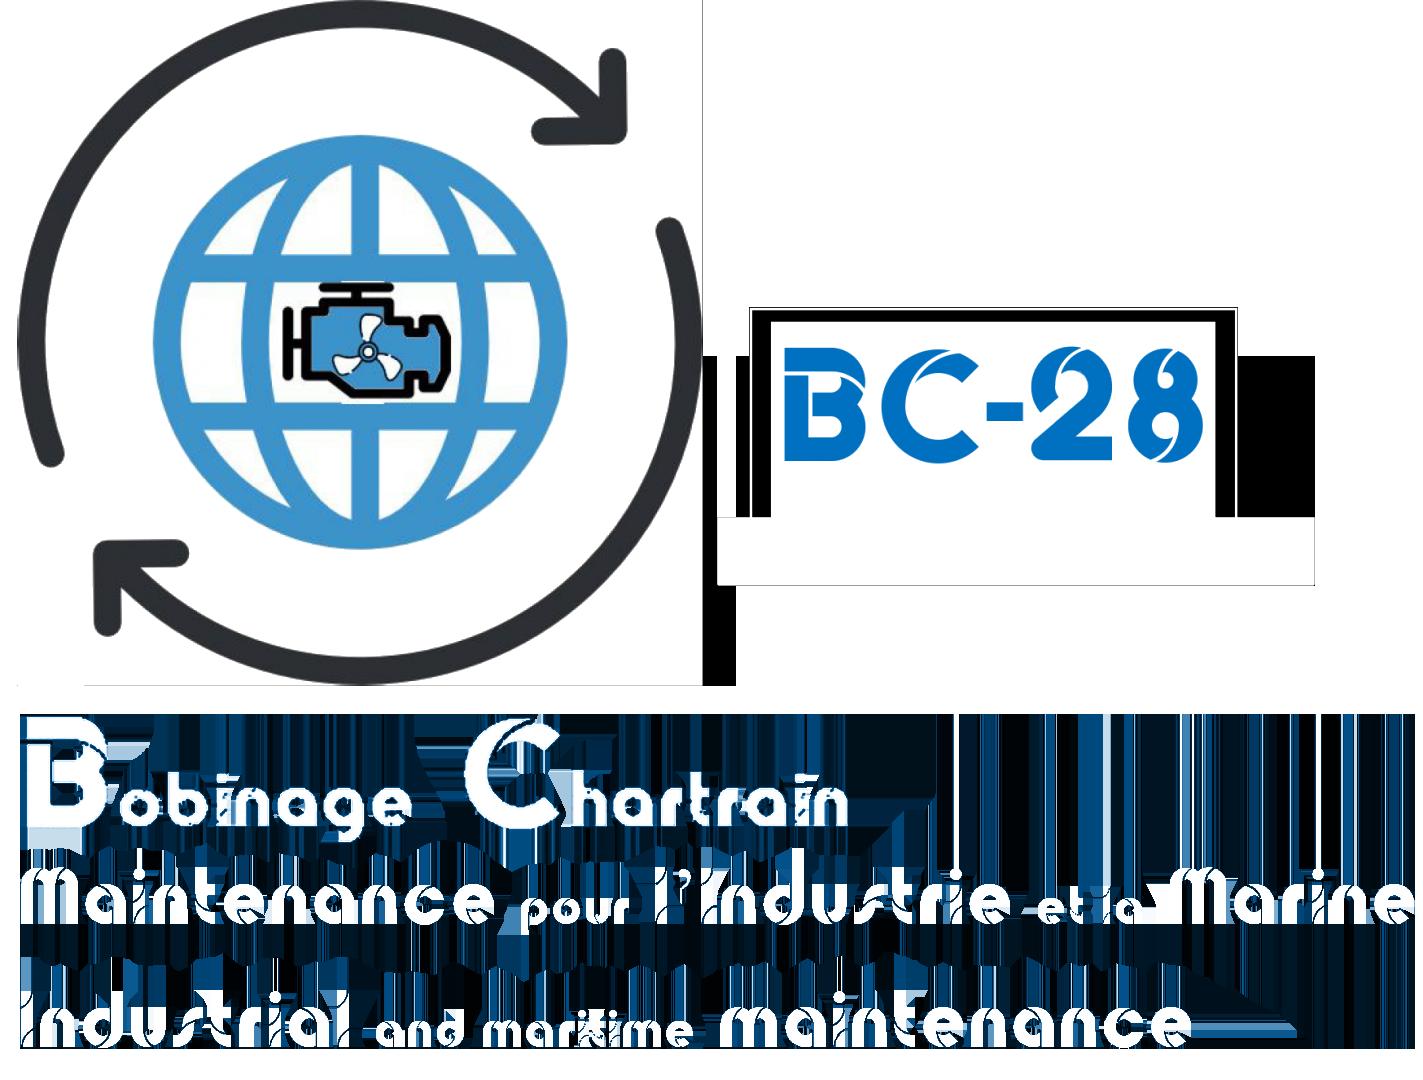 Logo Bobinage Chartrain